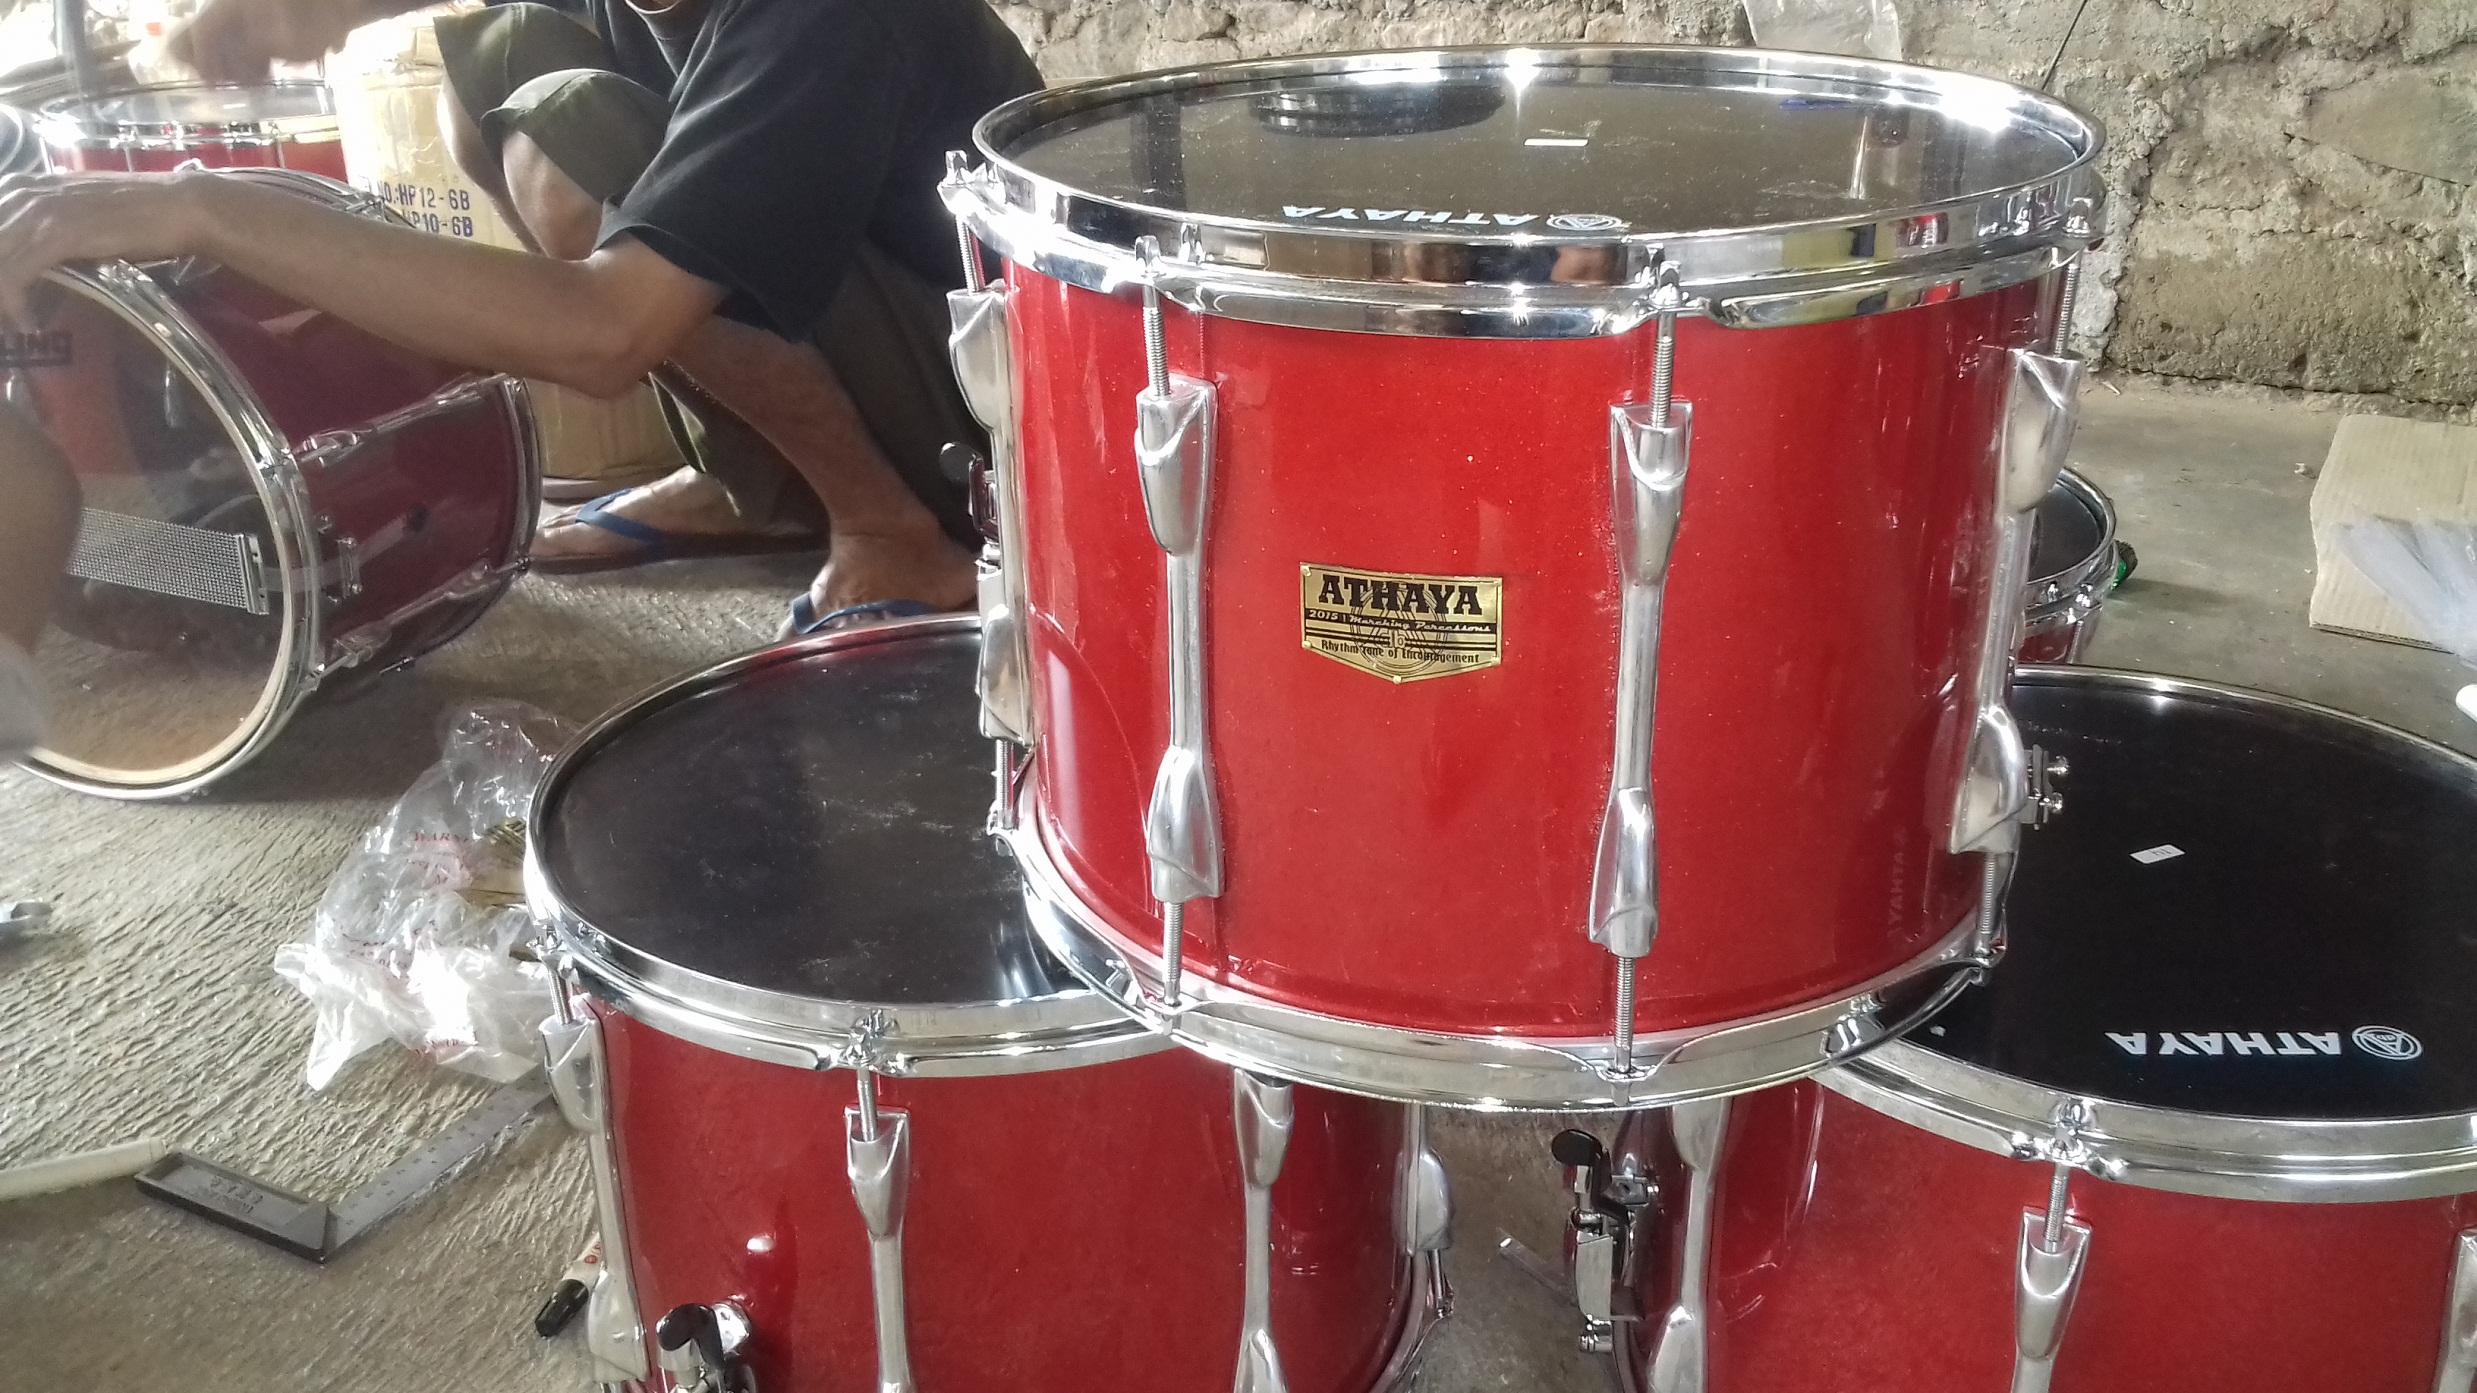 Daftar harga alat drumband terbaru 2018 | harga alat marching band terbaru 2018